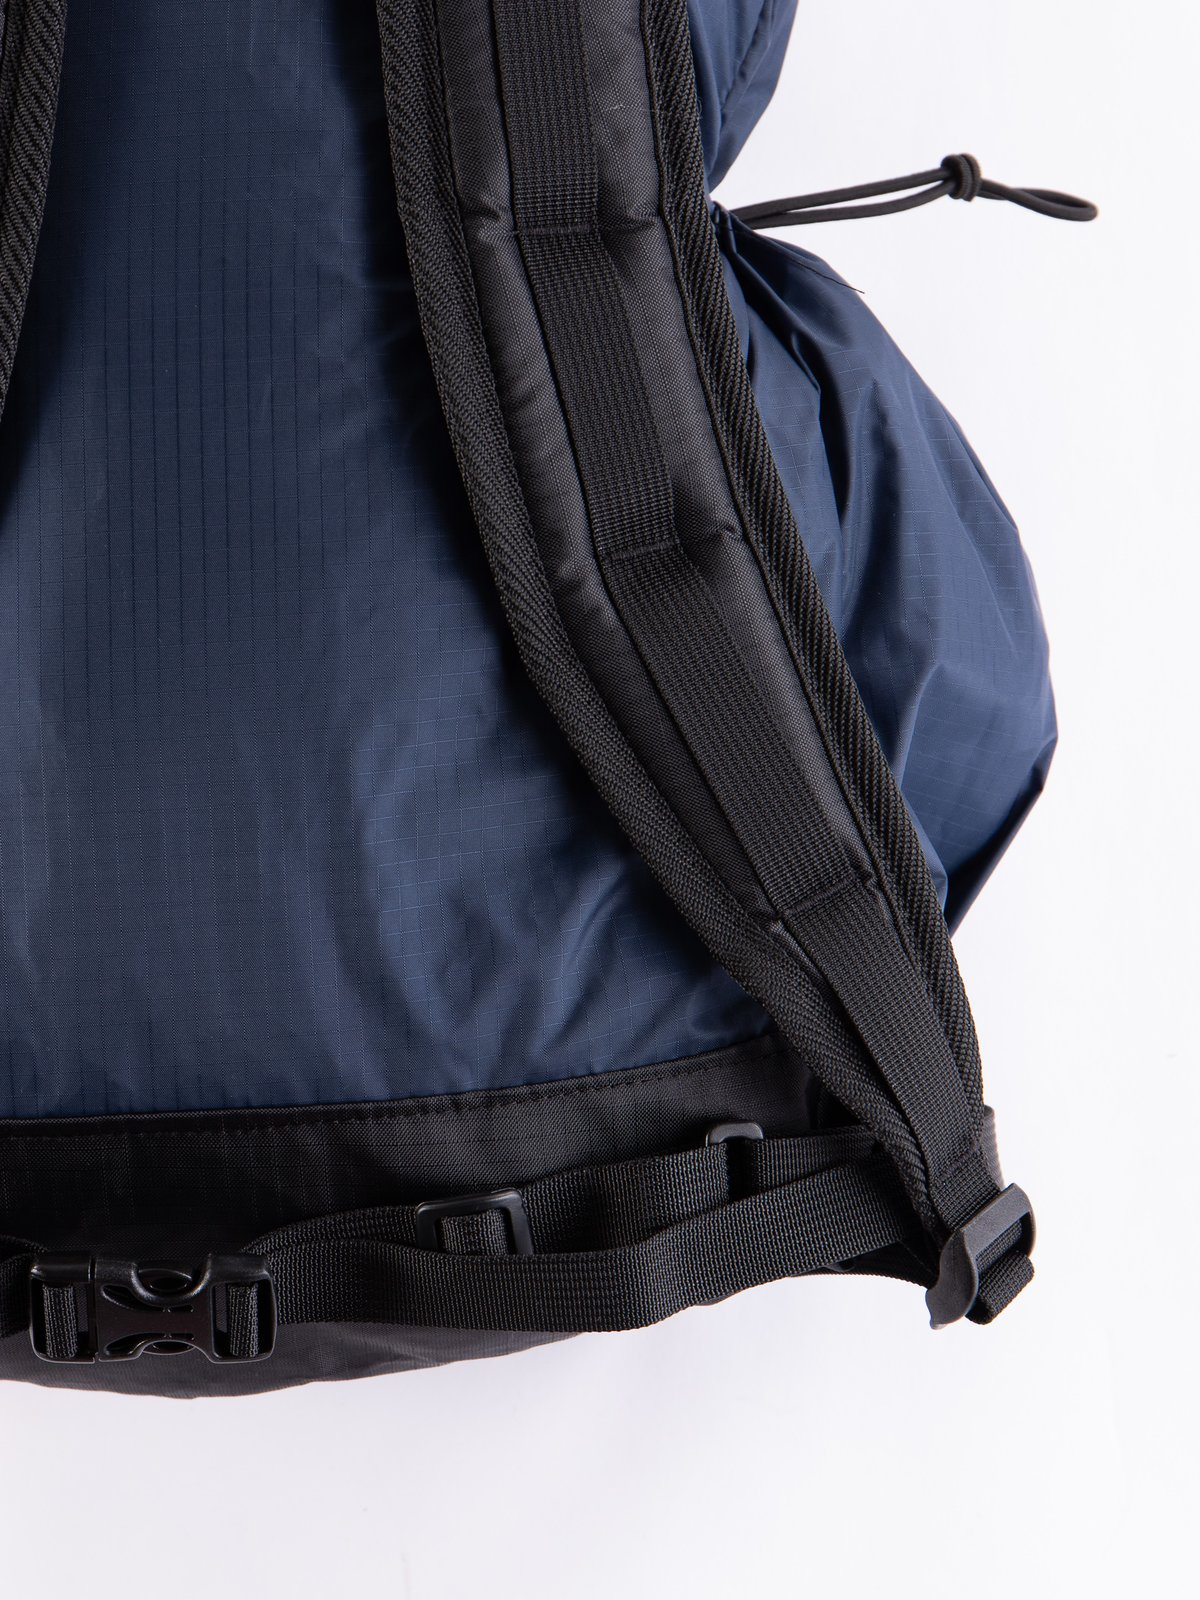 Navy Nylon Ripstop UL Backpack - Image 4